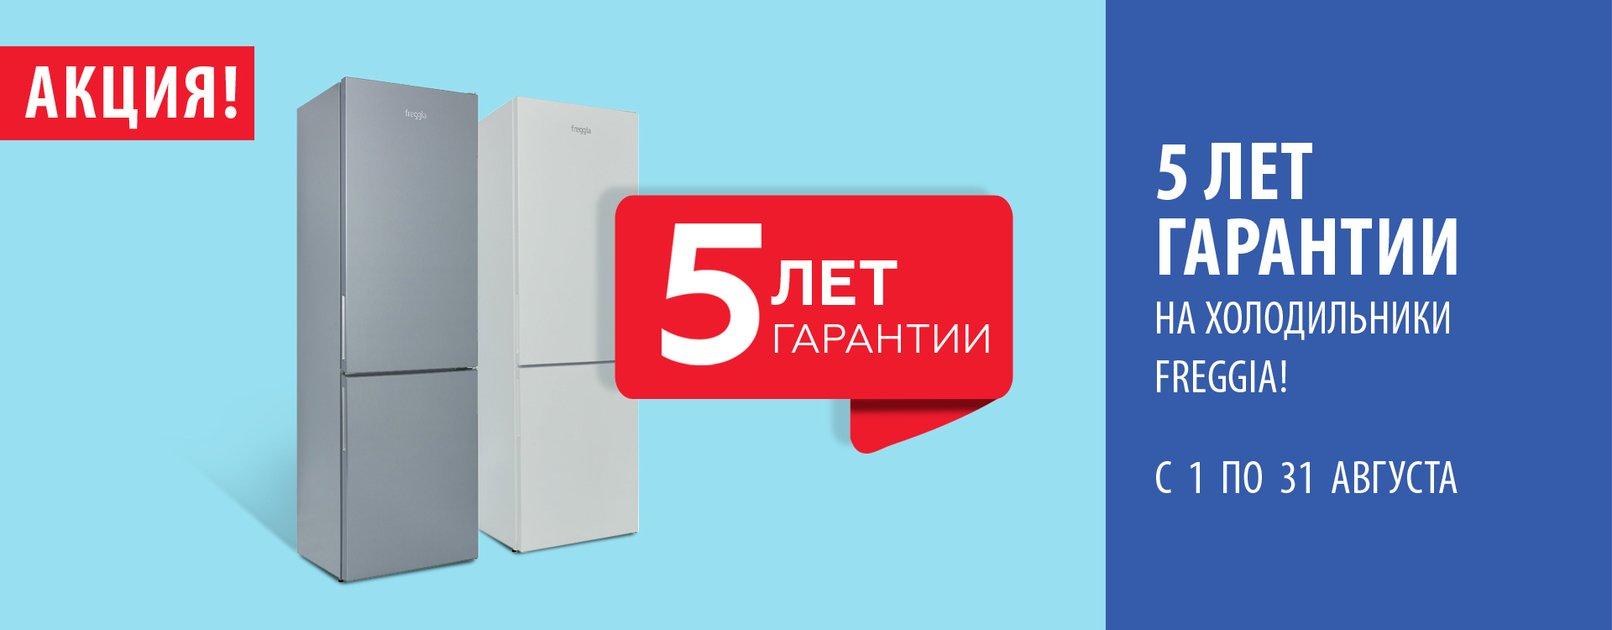 5 лет гарантии на холодильники Freggia